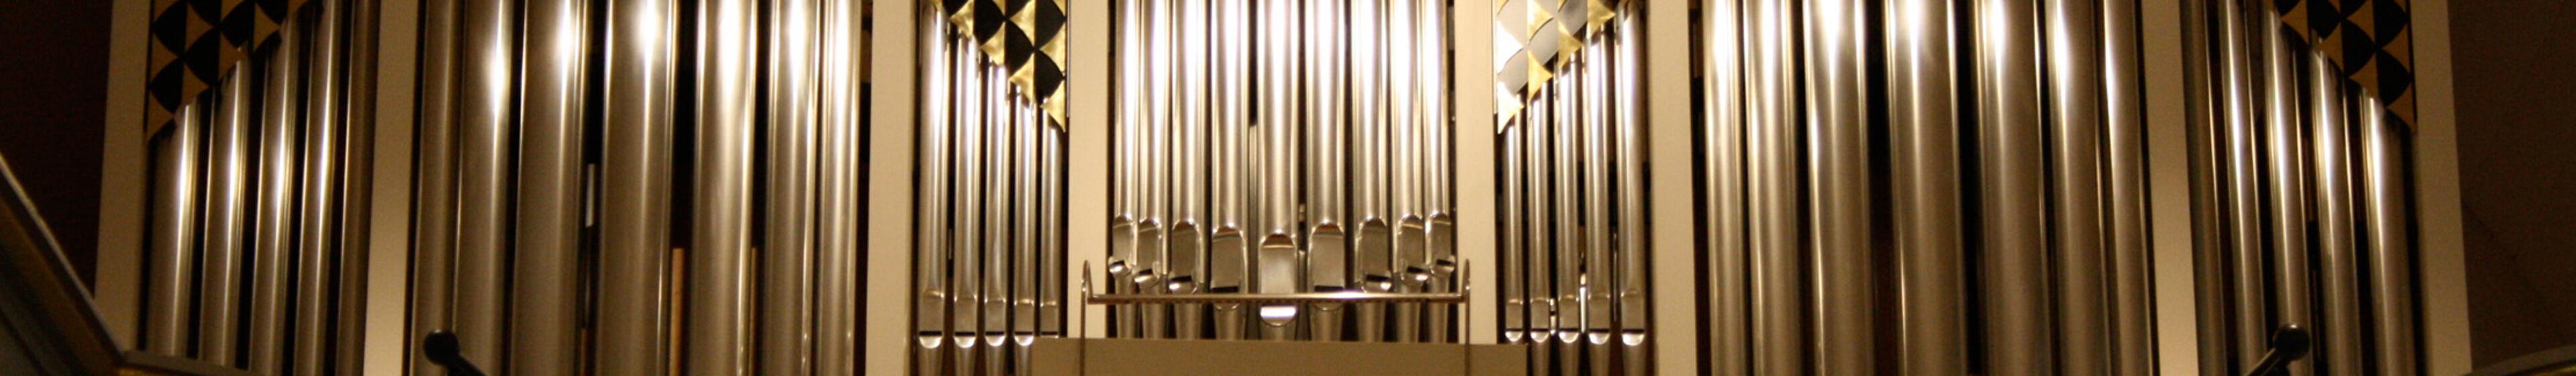 holle_orgel